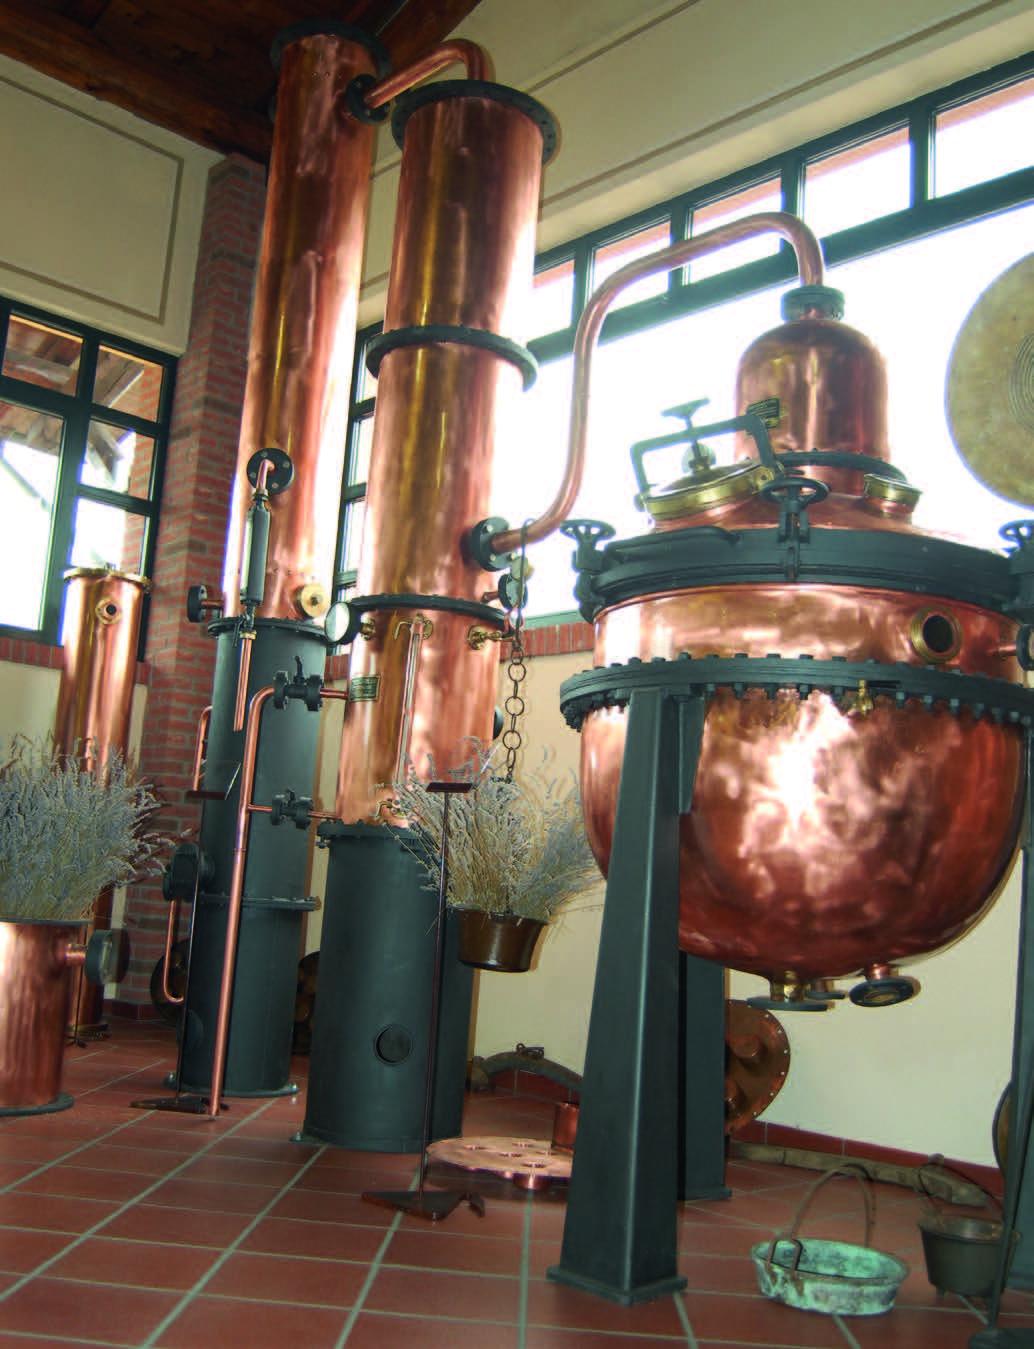 Garų kondensavimo kolona